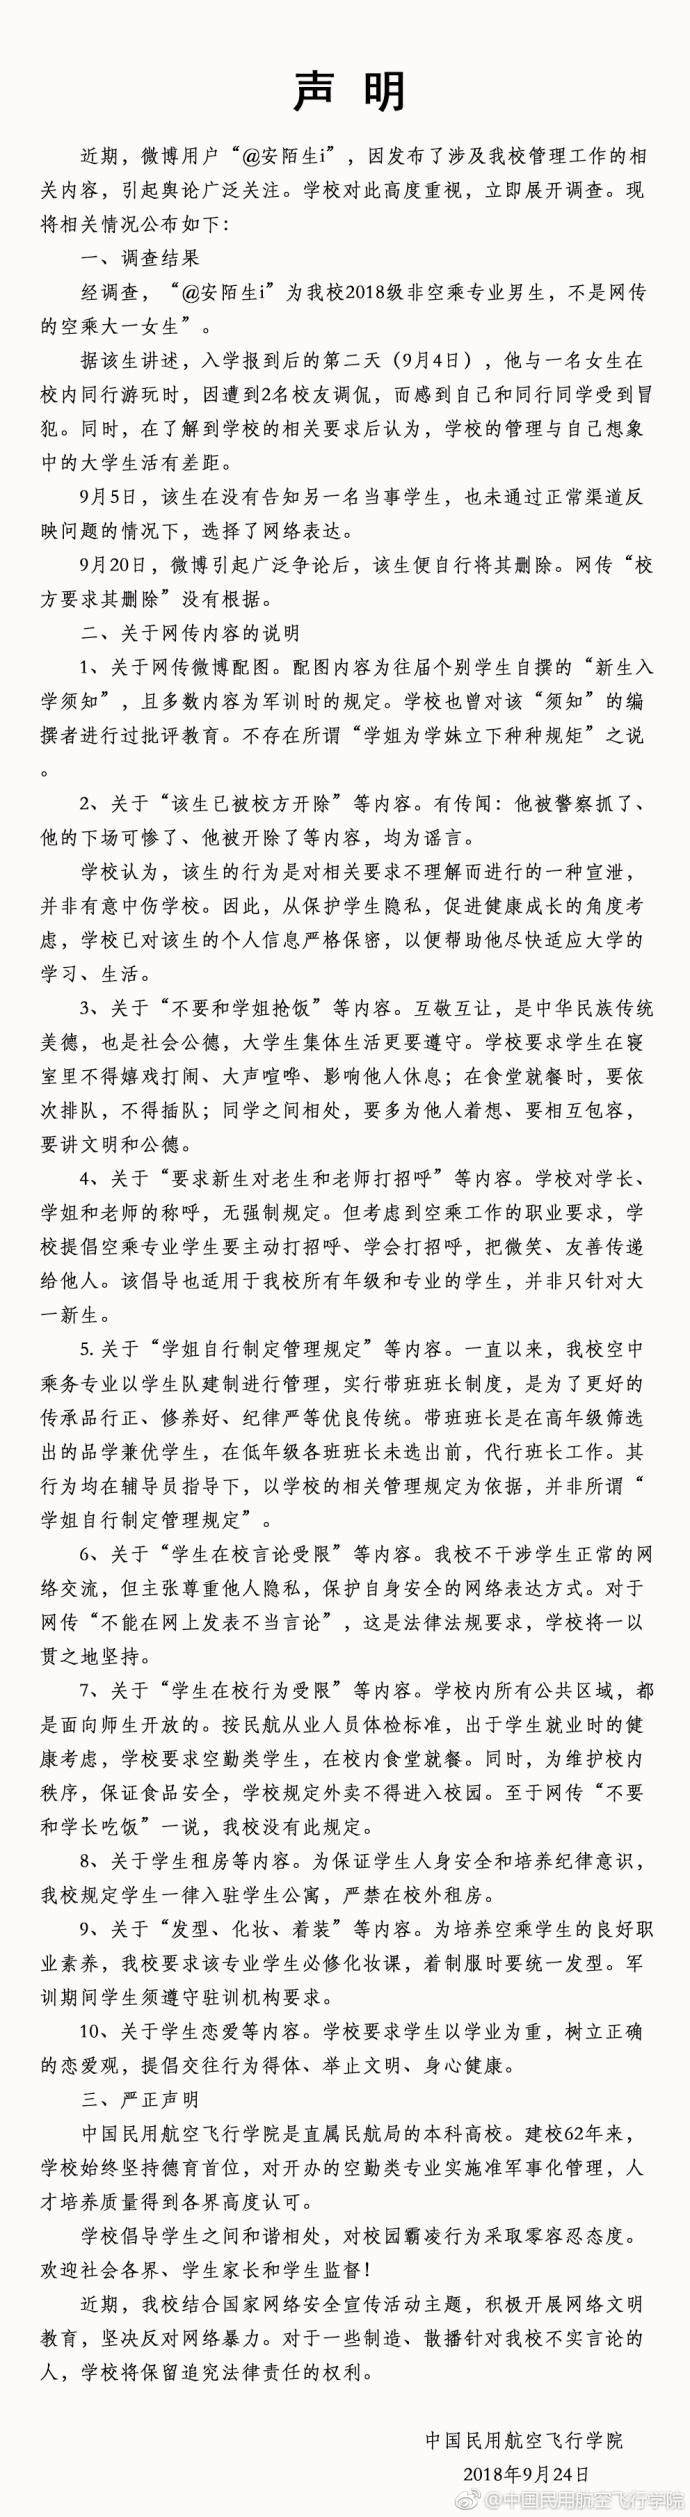 http://www.zgmaimai.cn/shehuiredian/107304.html